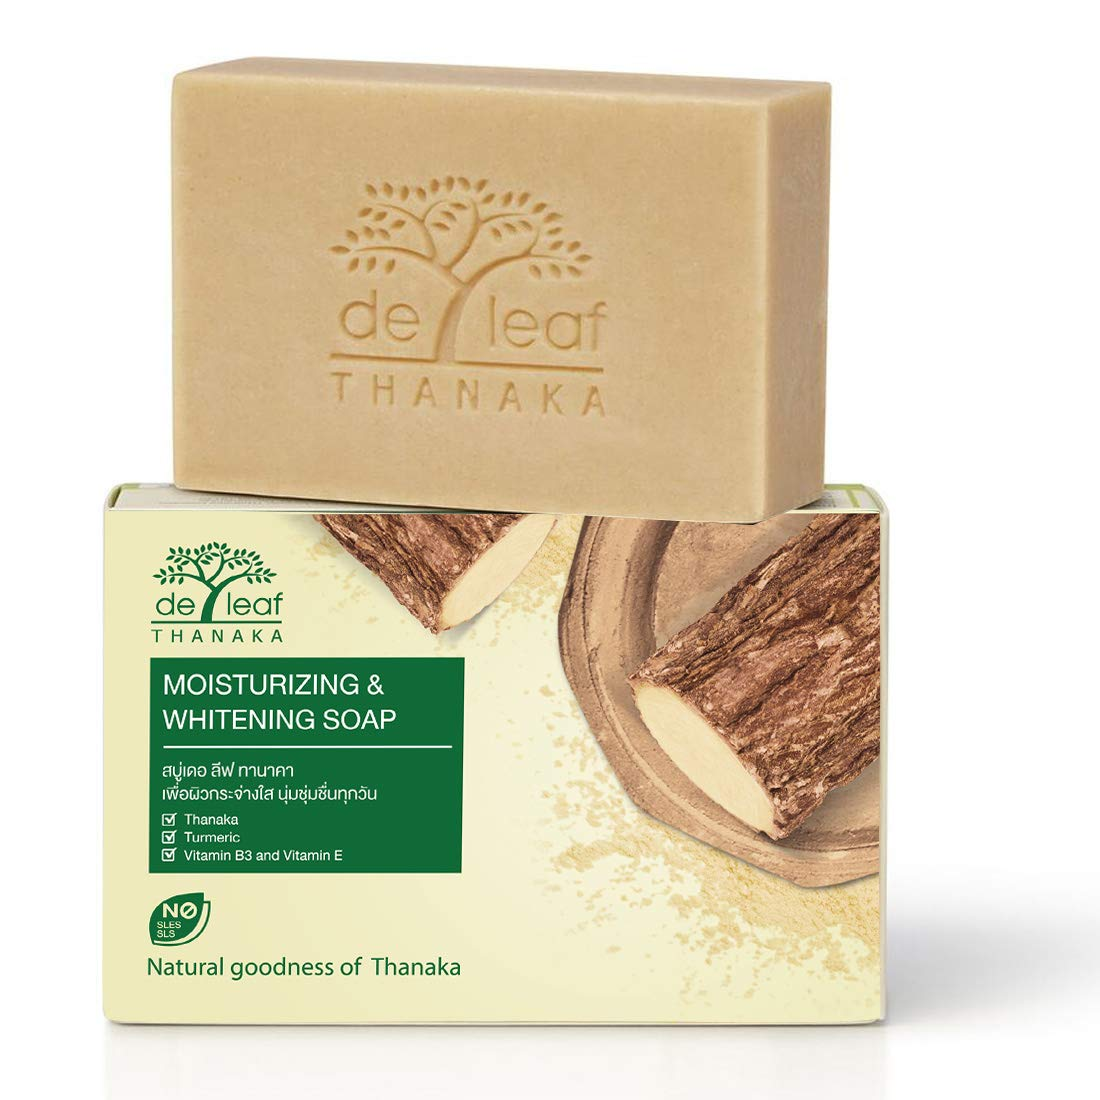 DE LEAF THANAKA Natural Moisturizing Whitening Bar Soap, Vitamin B3 E Beauty Deep Cleansing Hydration Moisturize Clean Natural Face Facial Body Skin Soap, 100g 12 Pack Count Thanaka